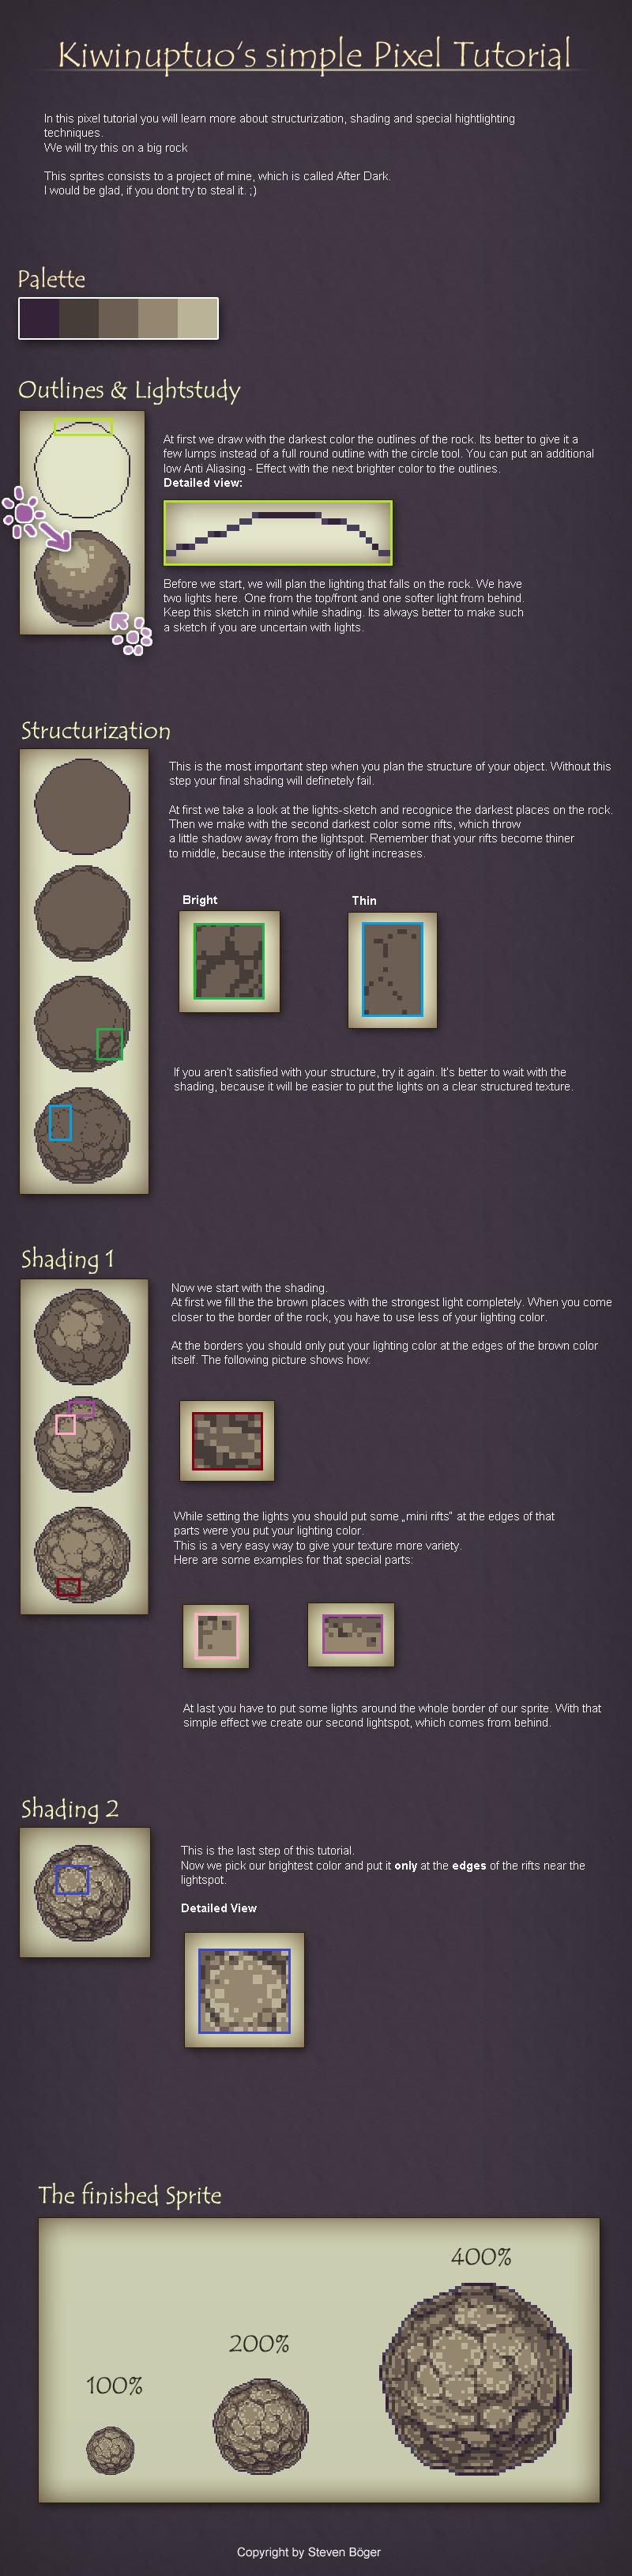 pixel_tutorial___shading_by_kiwinuptuod31mp0f.png